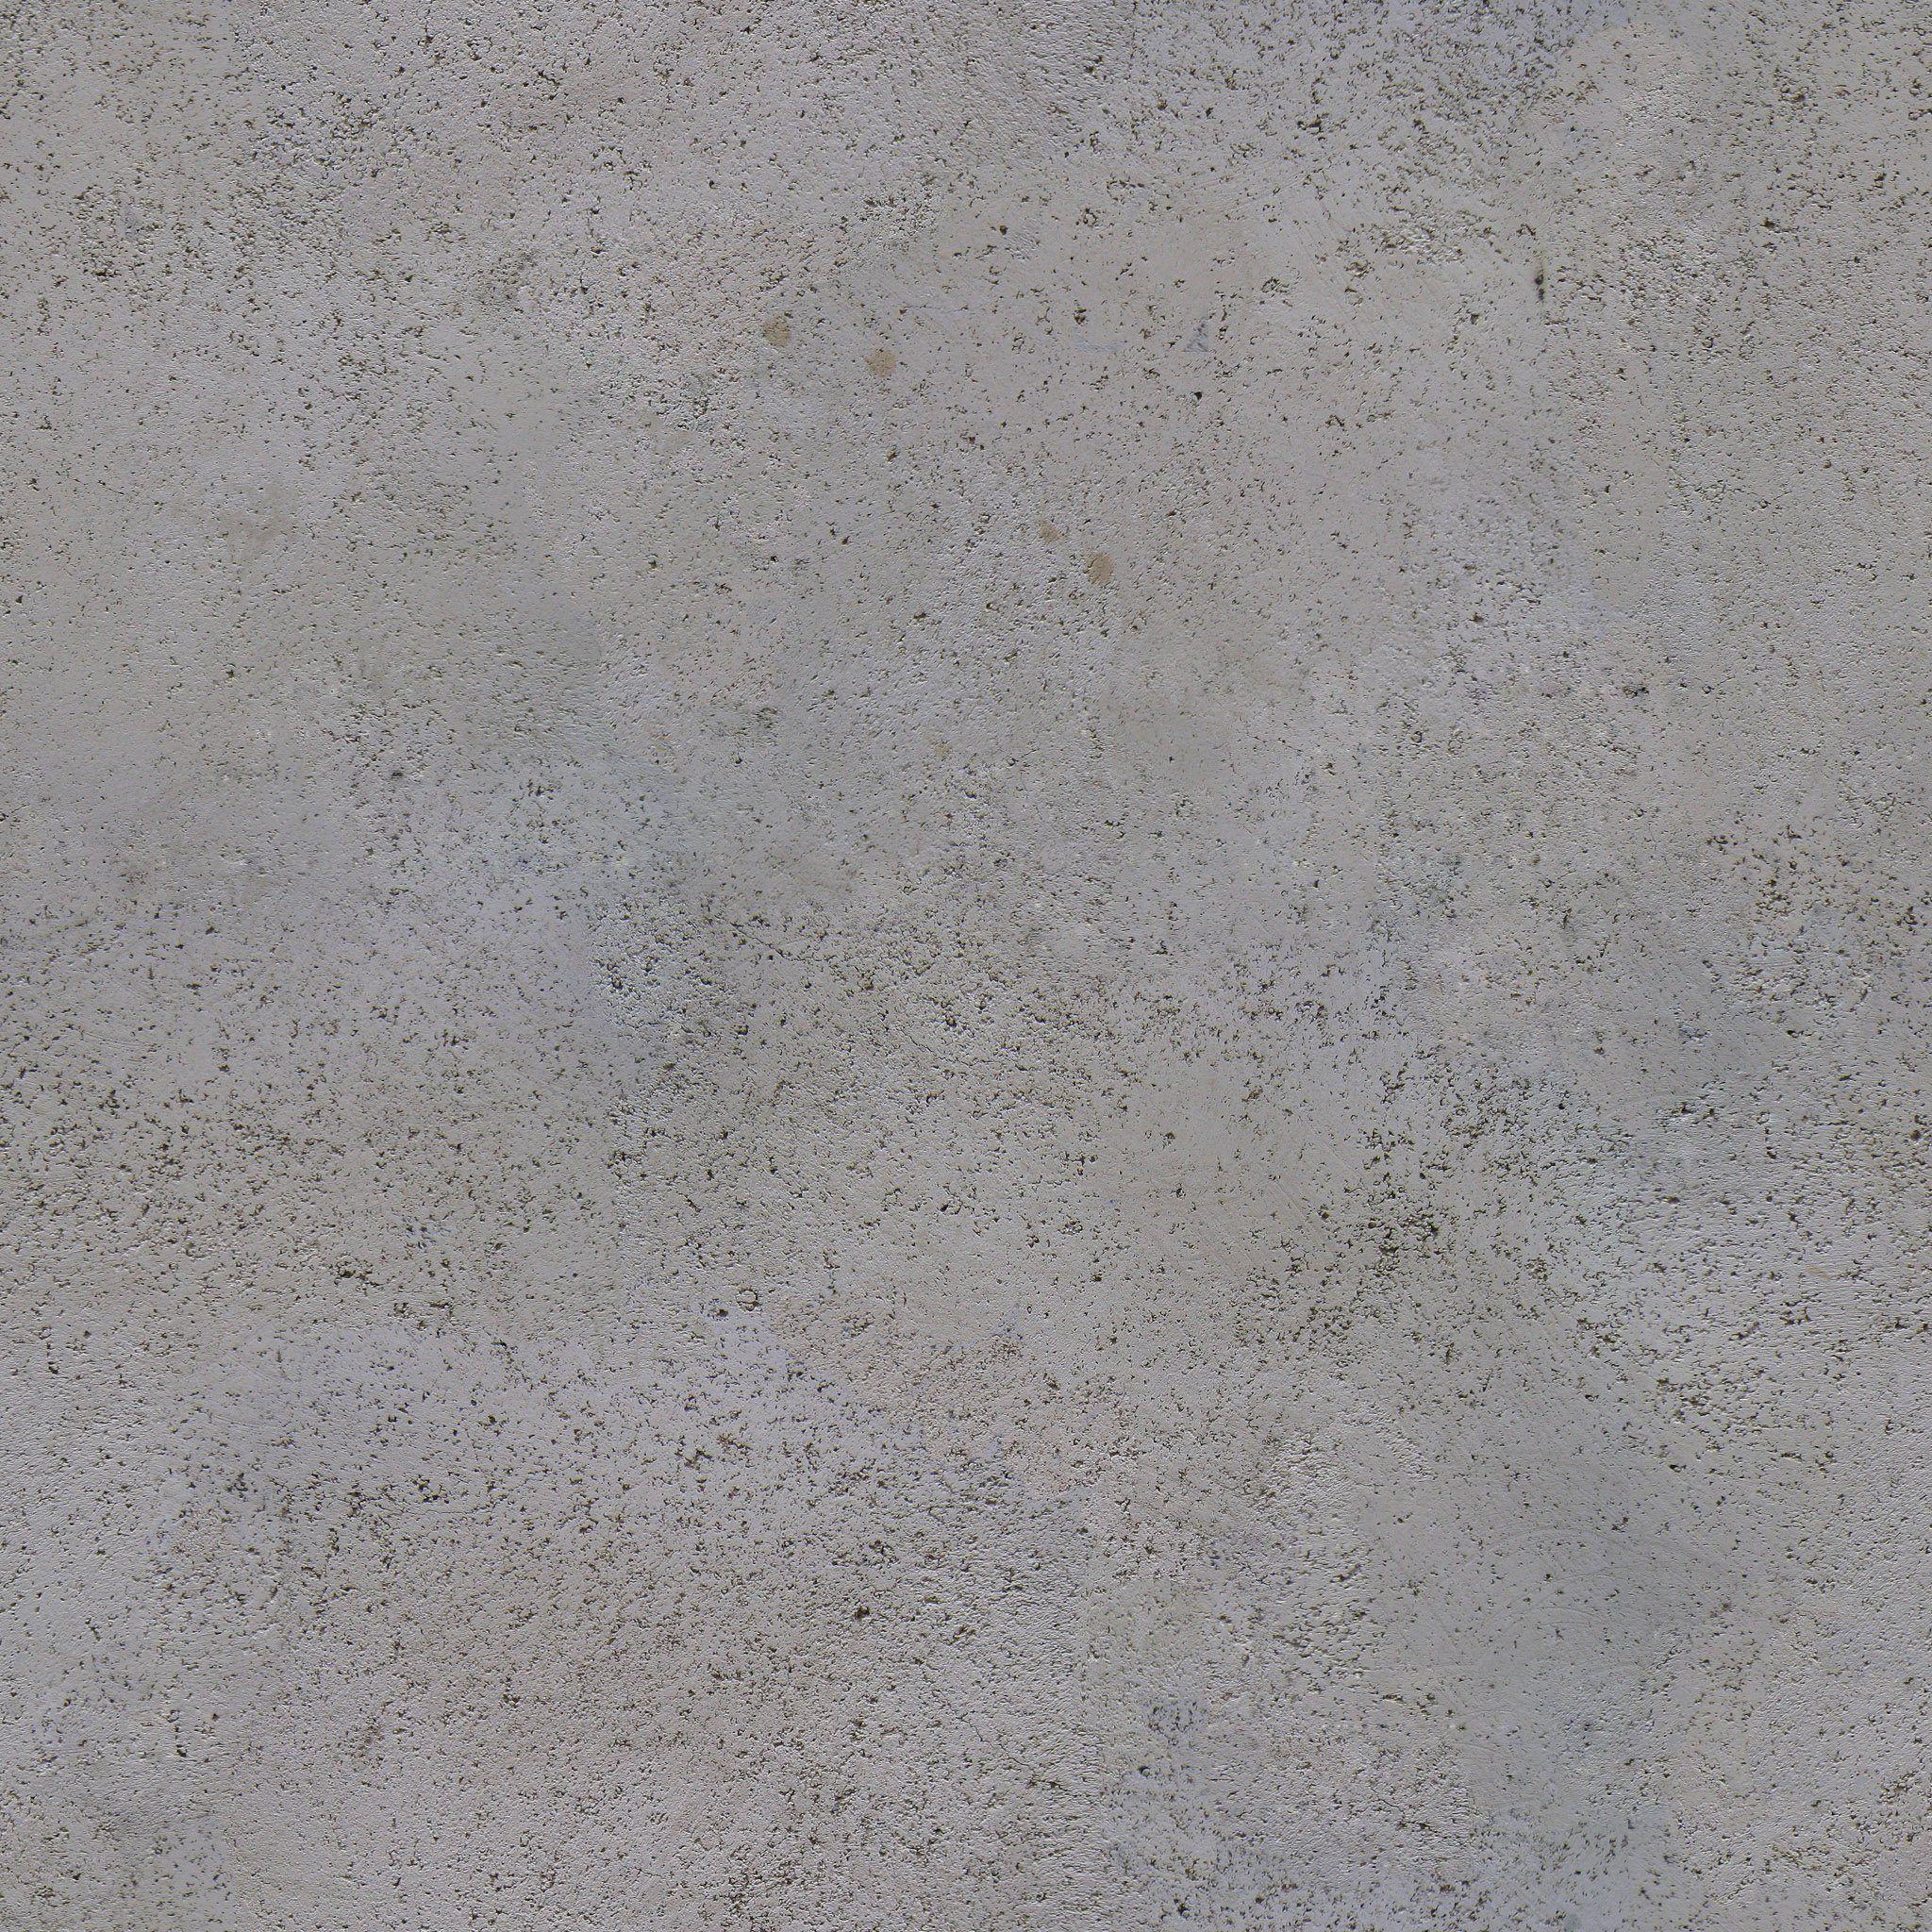 Cement texture photo